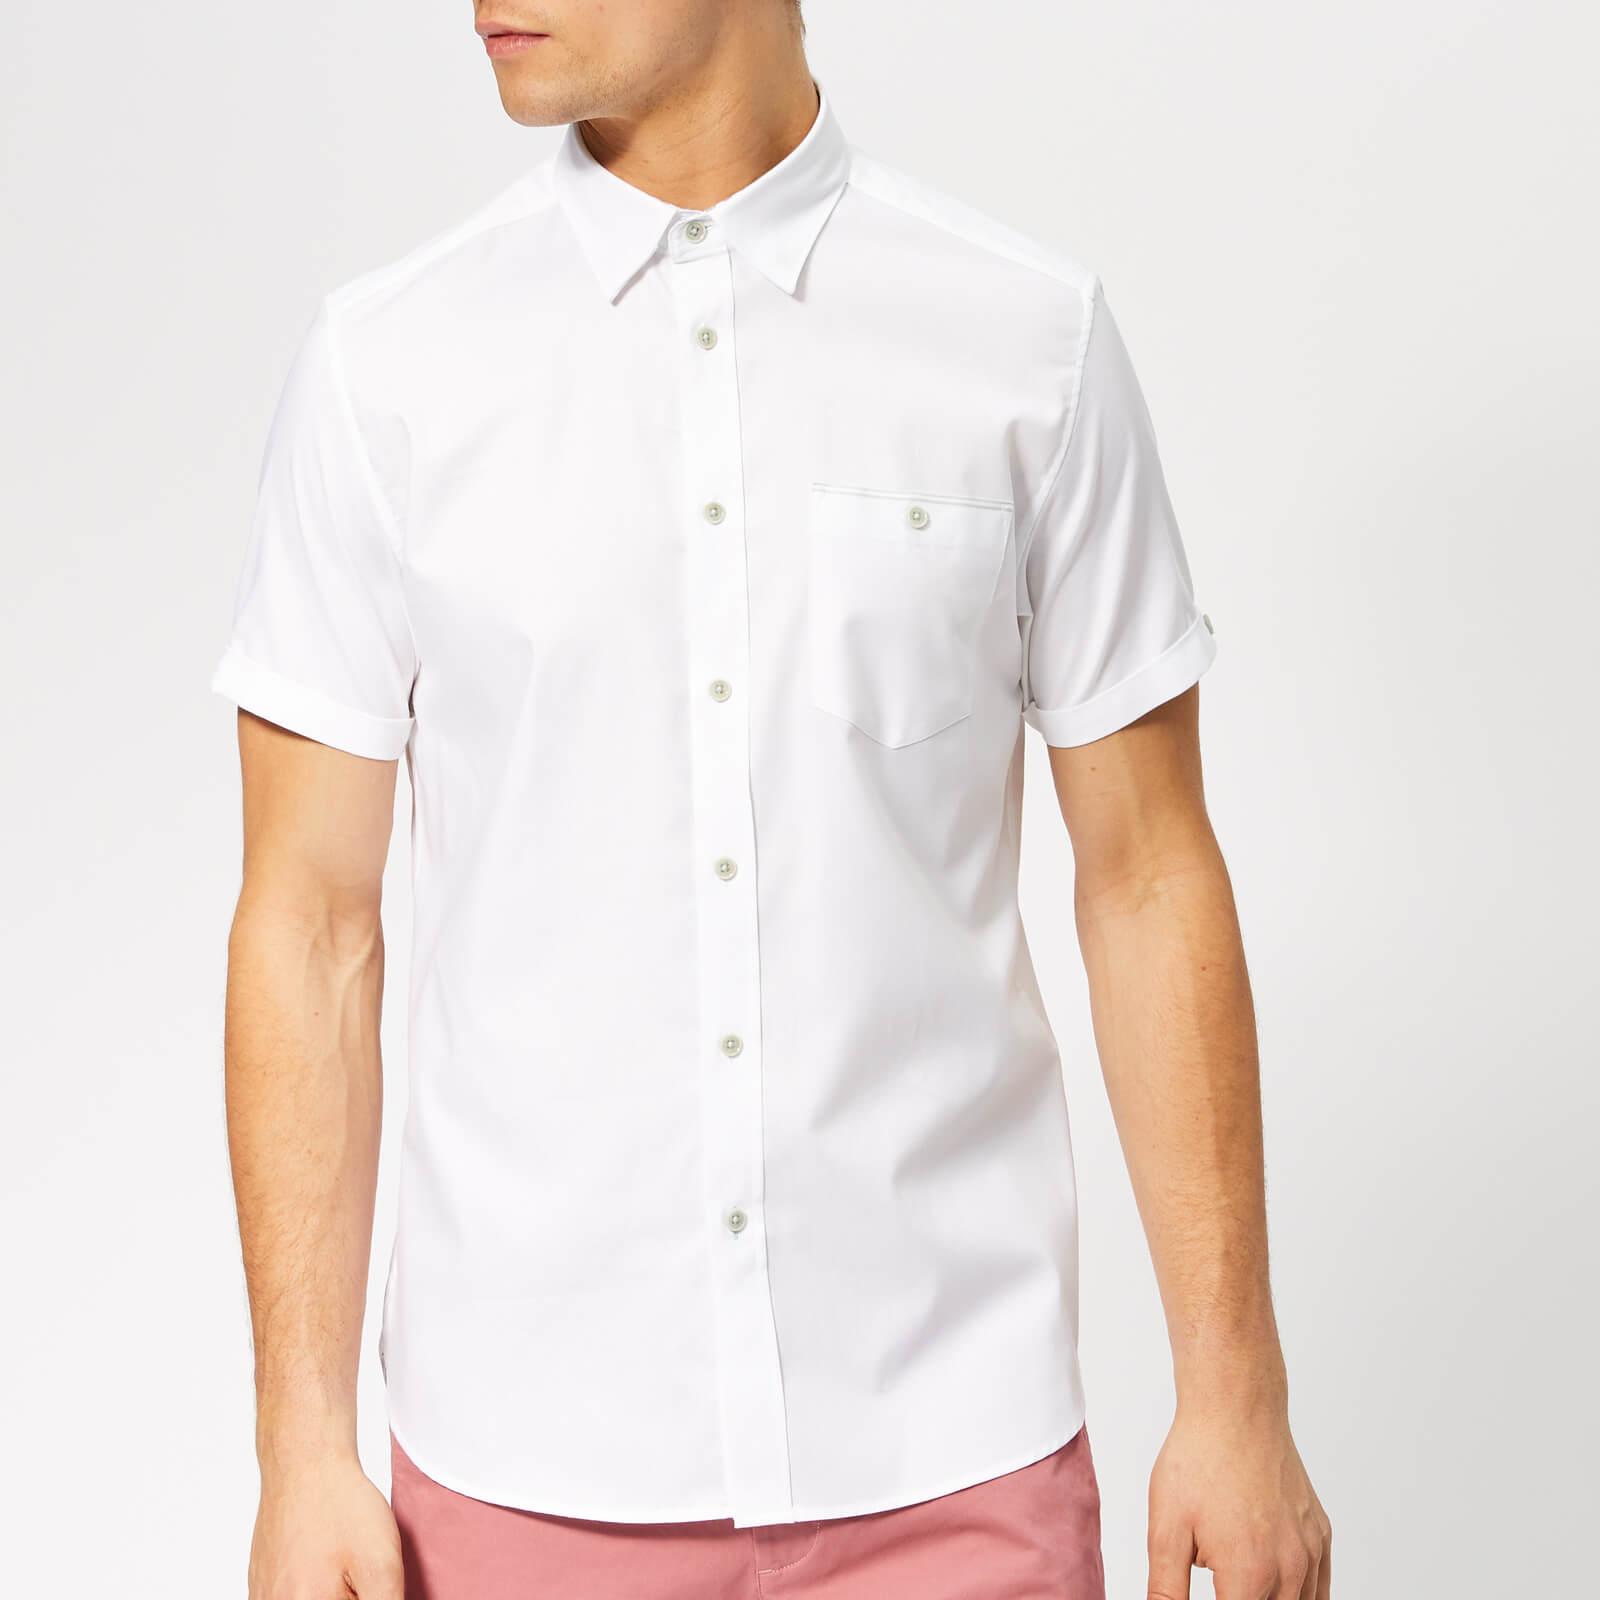 0da71d81 Ted Baker Men's Wallabi Short Sleeve Shirt - White Mens Clothing |  TheHut.com